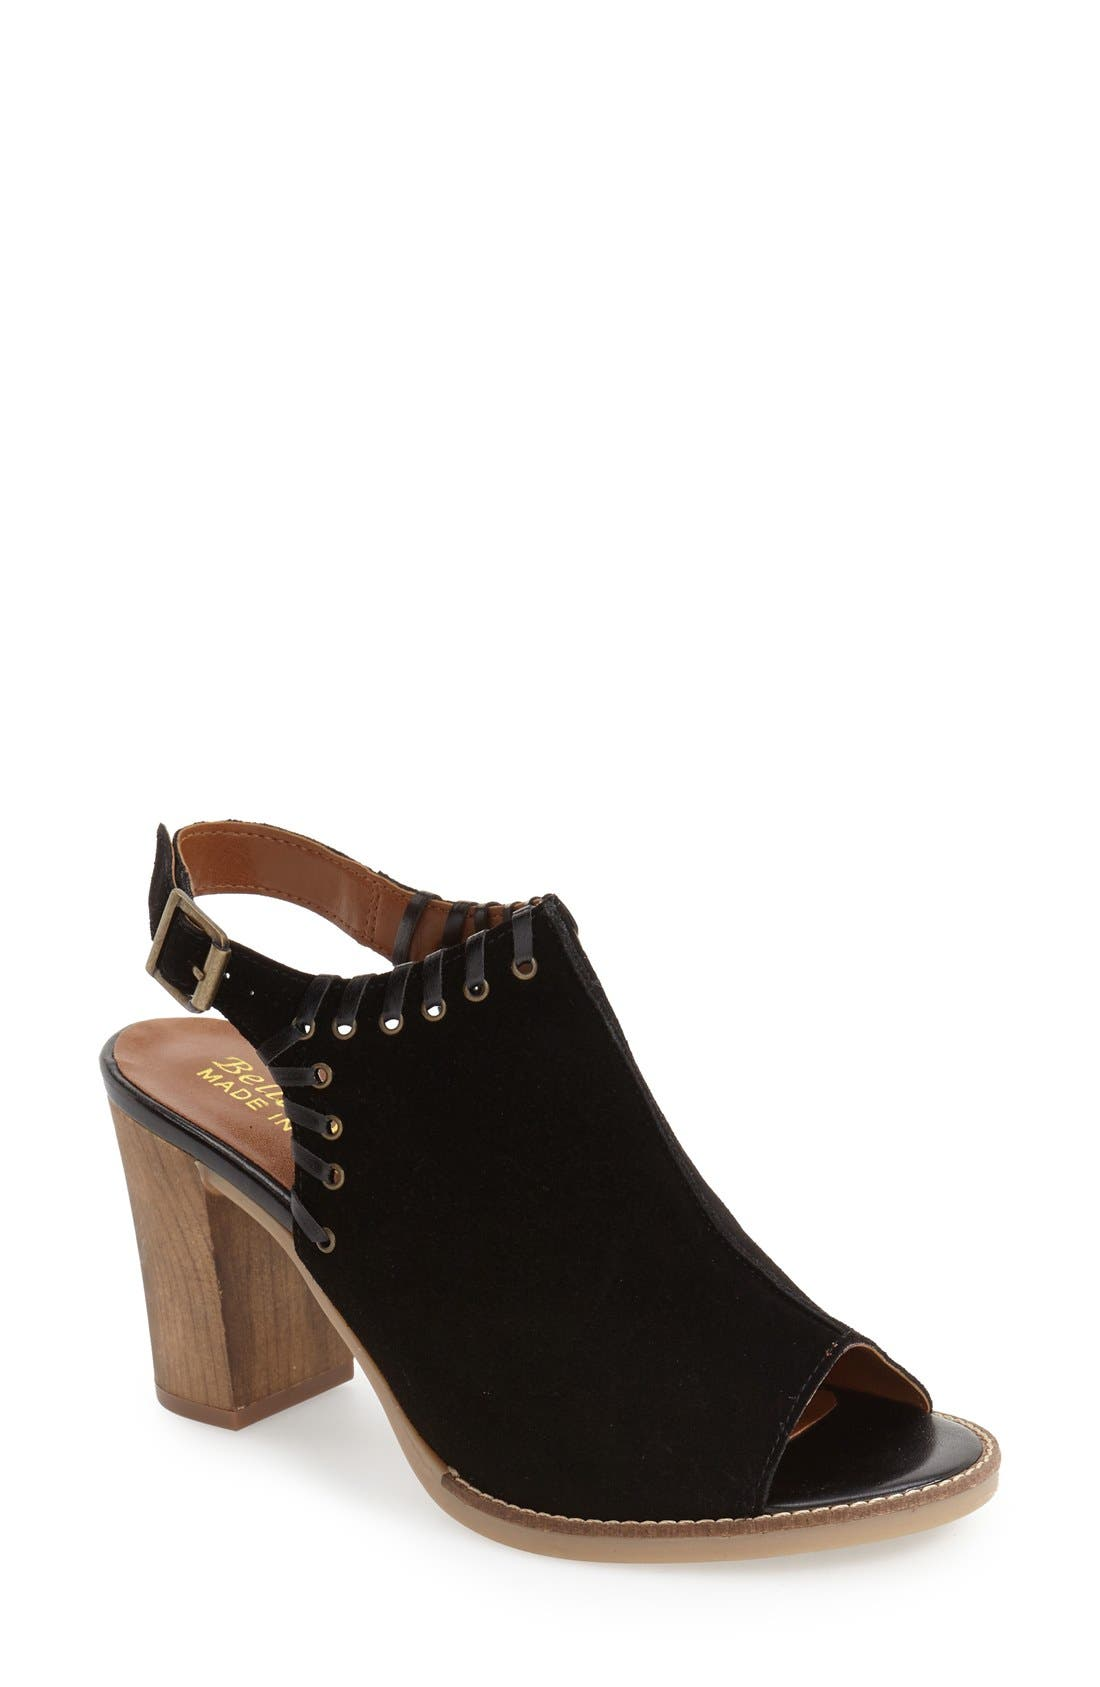 'Ora' Block Heel Slingback Sandal,                             Main thumbnail 1, color,                             018